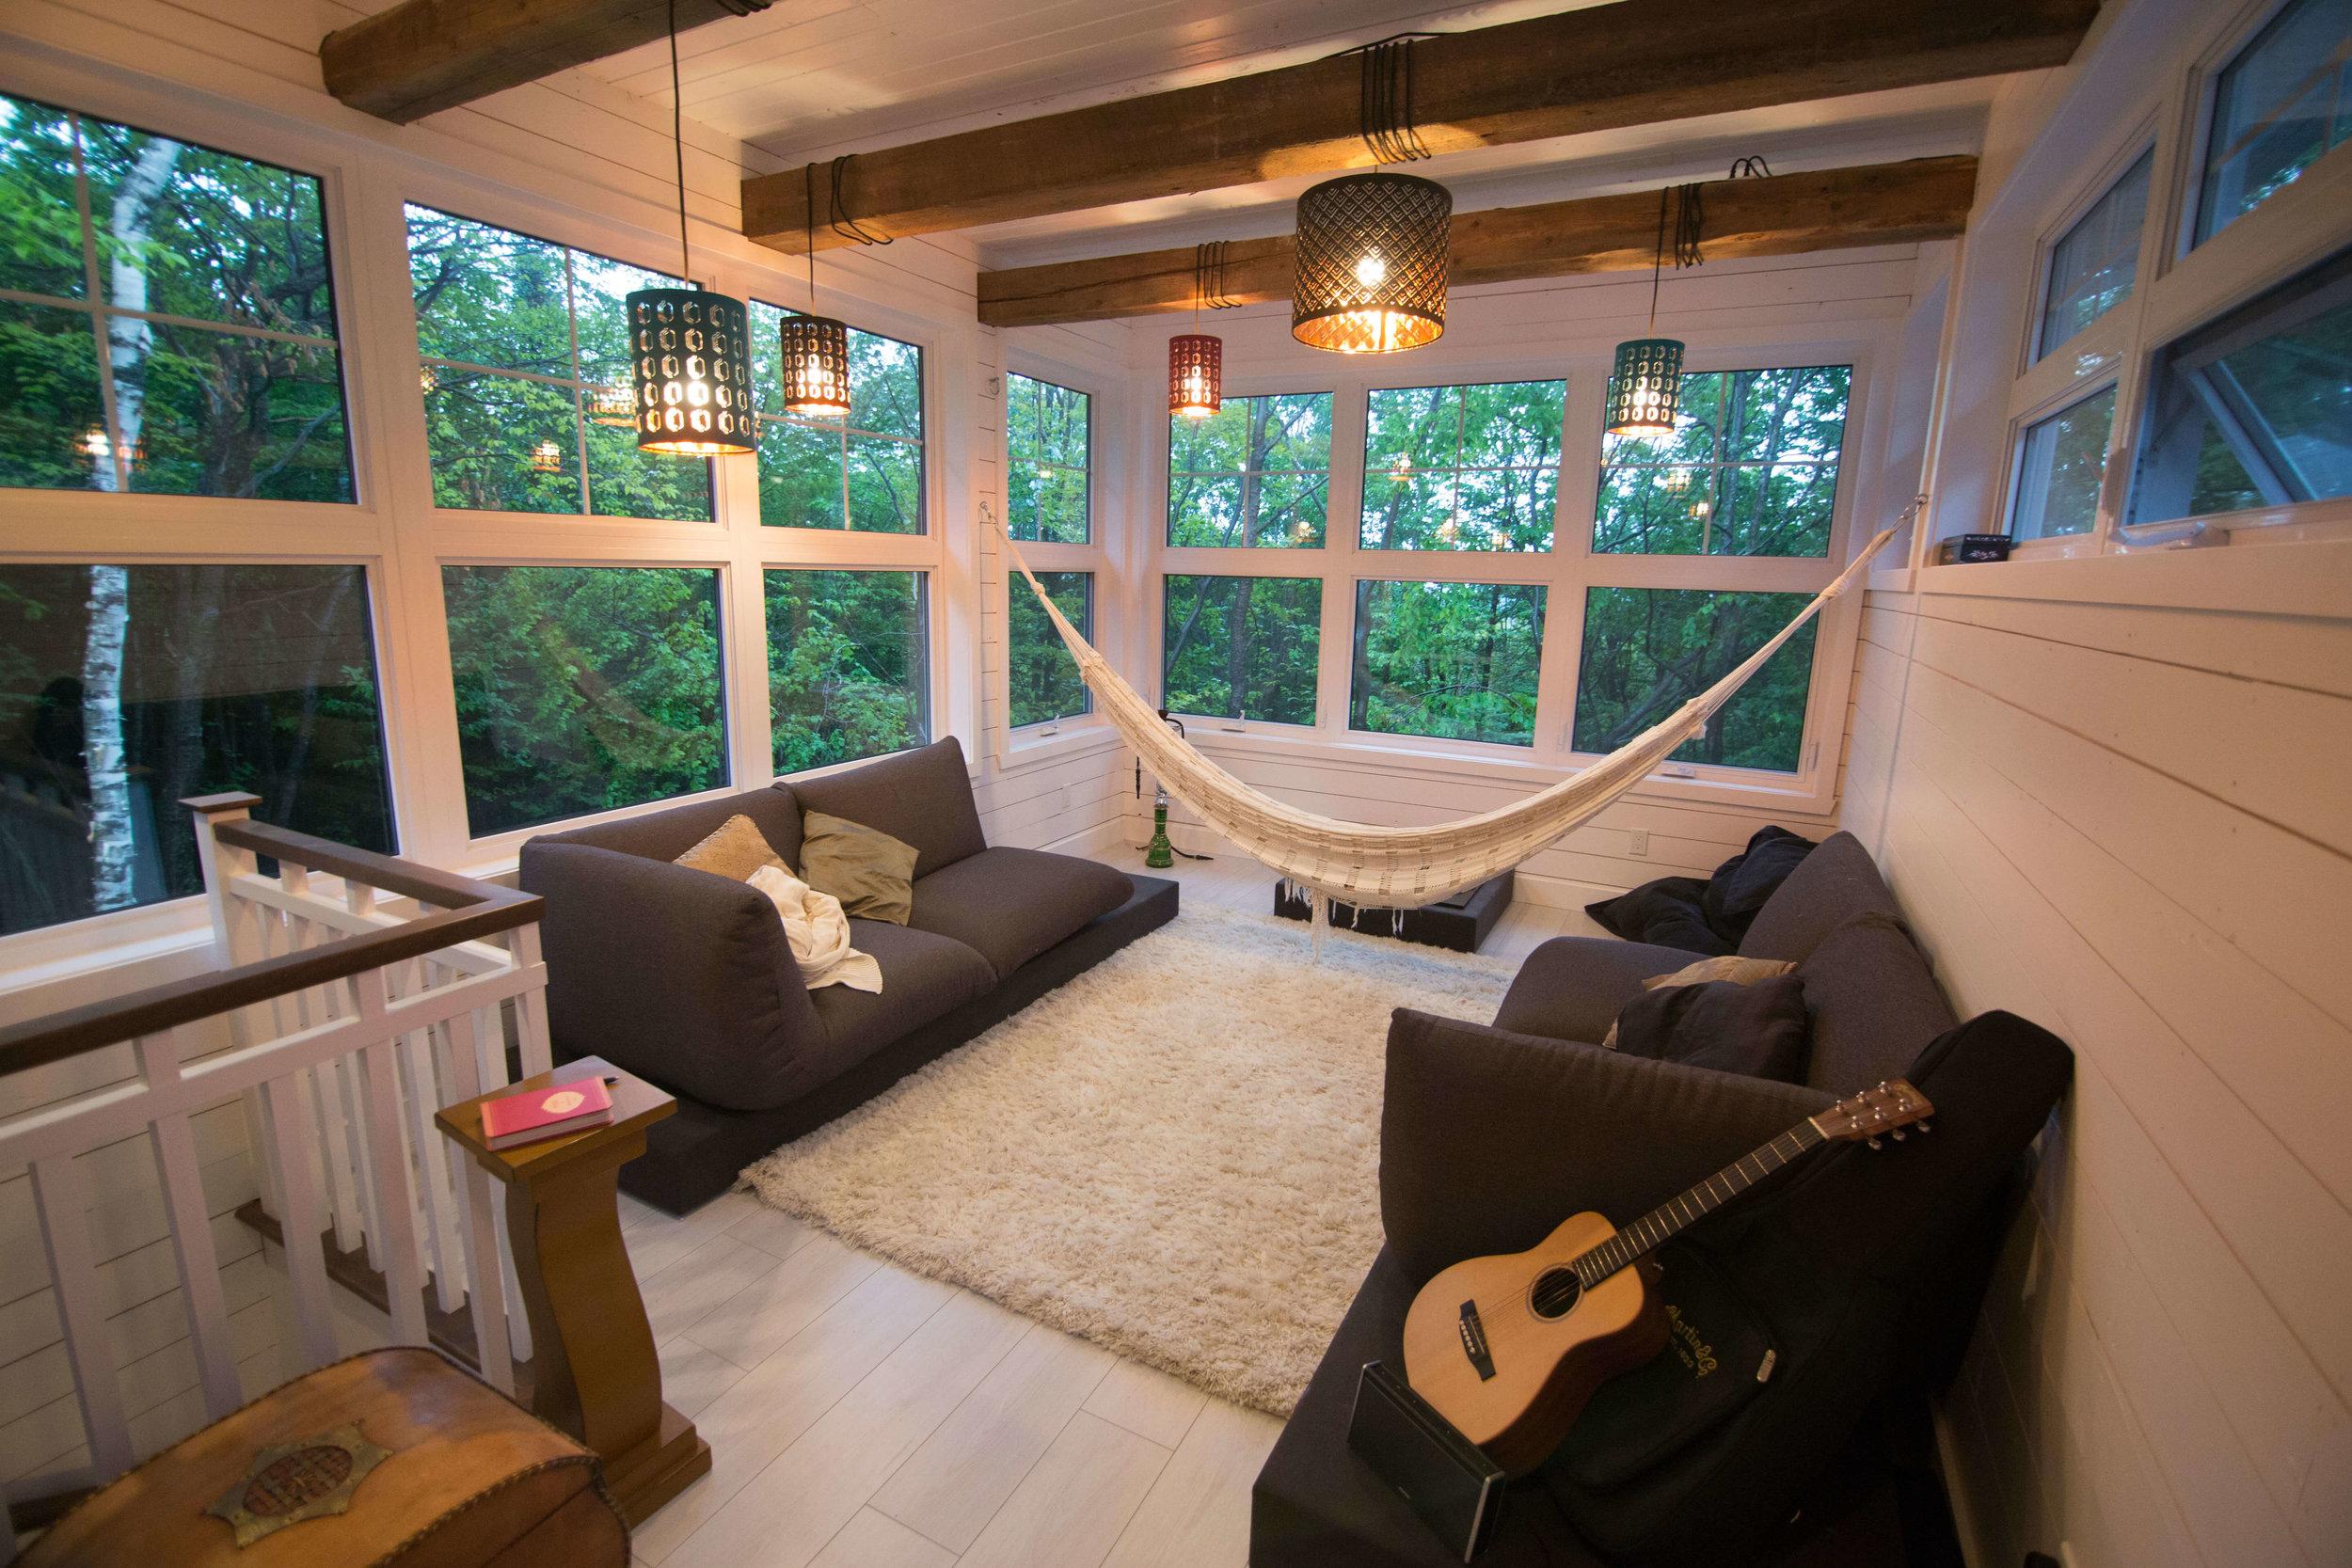 chill-room-nobilis-2016-renovation-leblanc